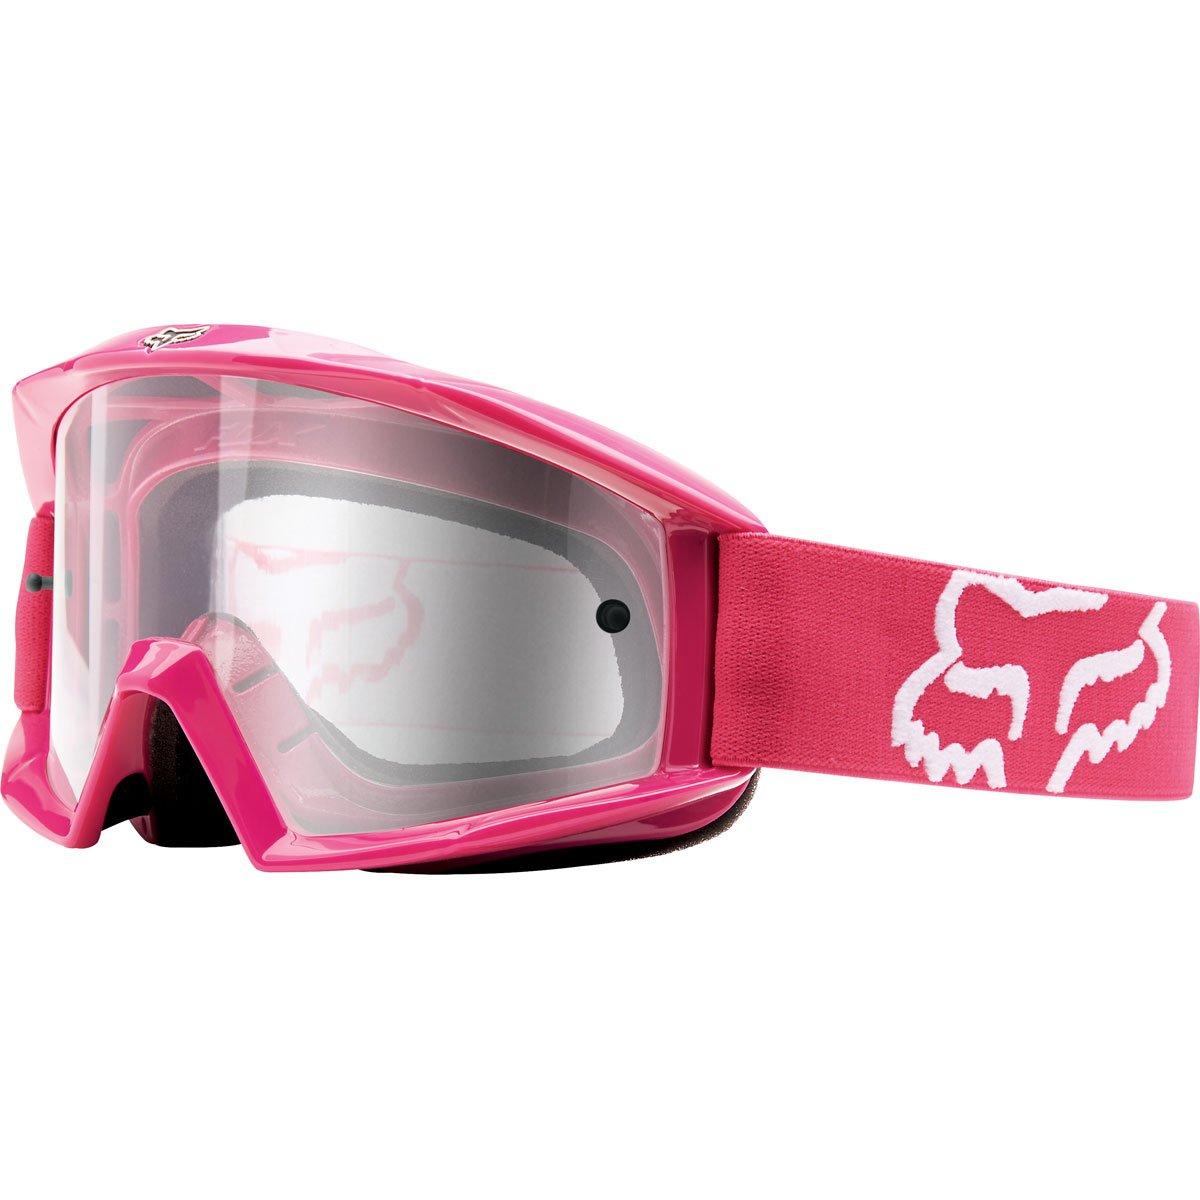 Fox Racing Adult Main Goggles Eyewear - One Size/Pink